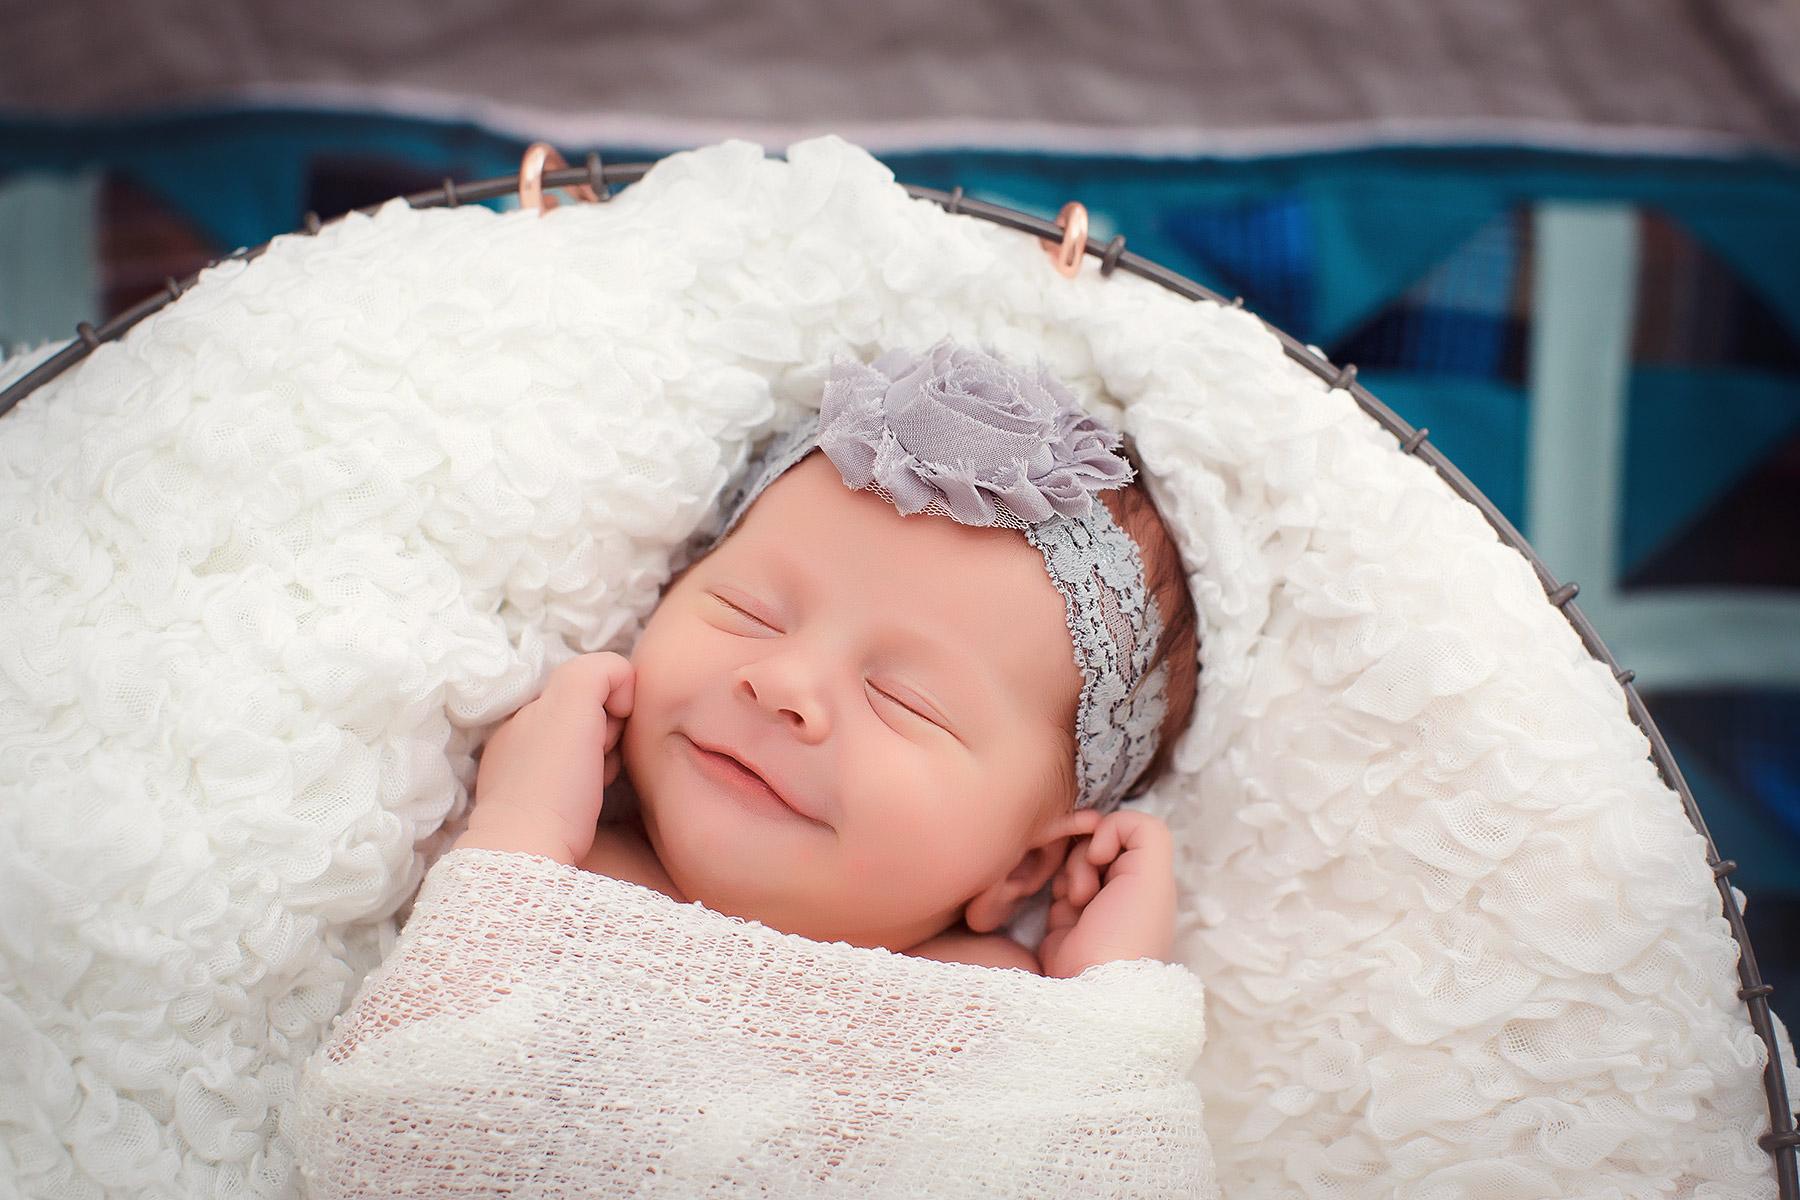 Newborn-photographers-maternity-photographers-berks-county-pa_U